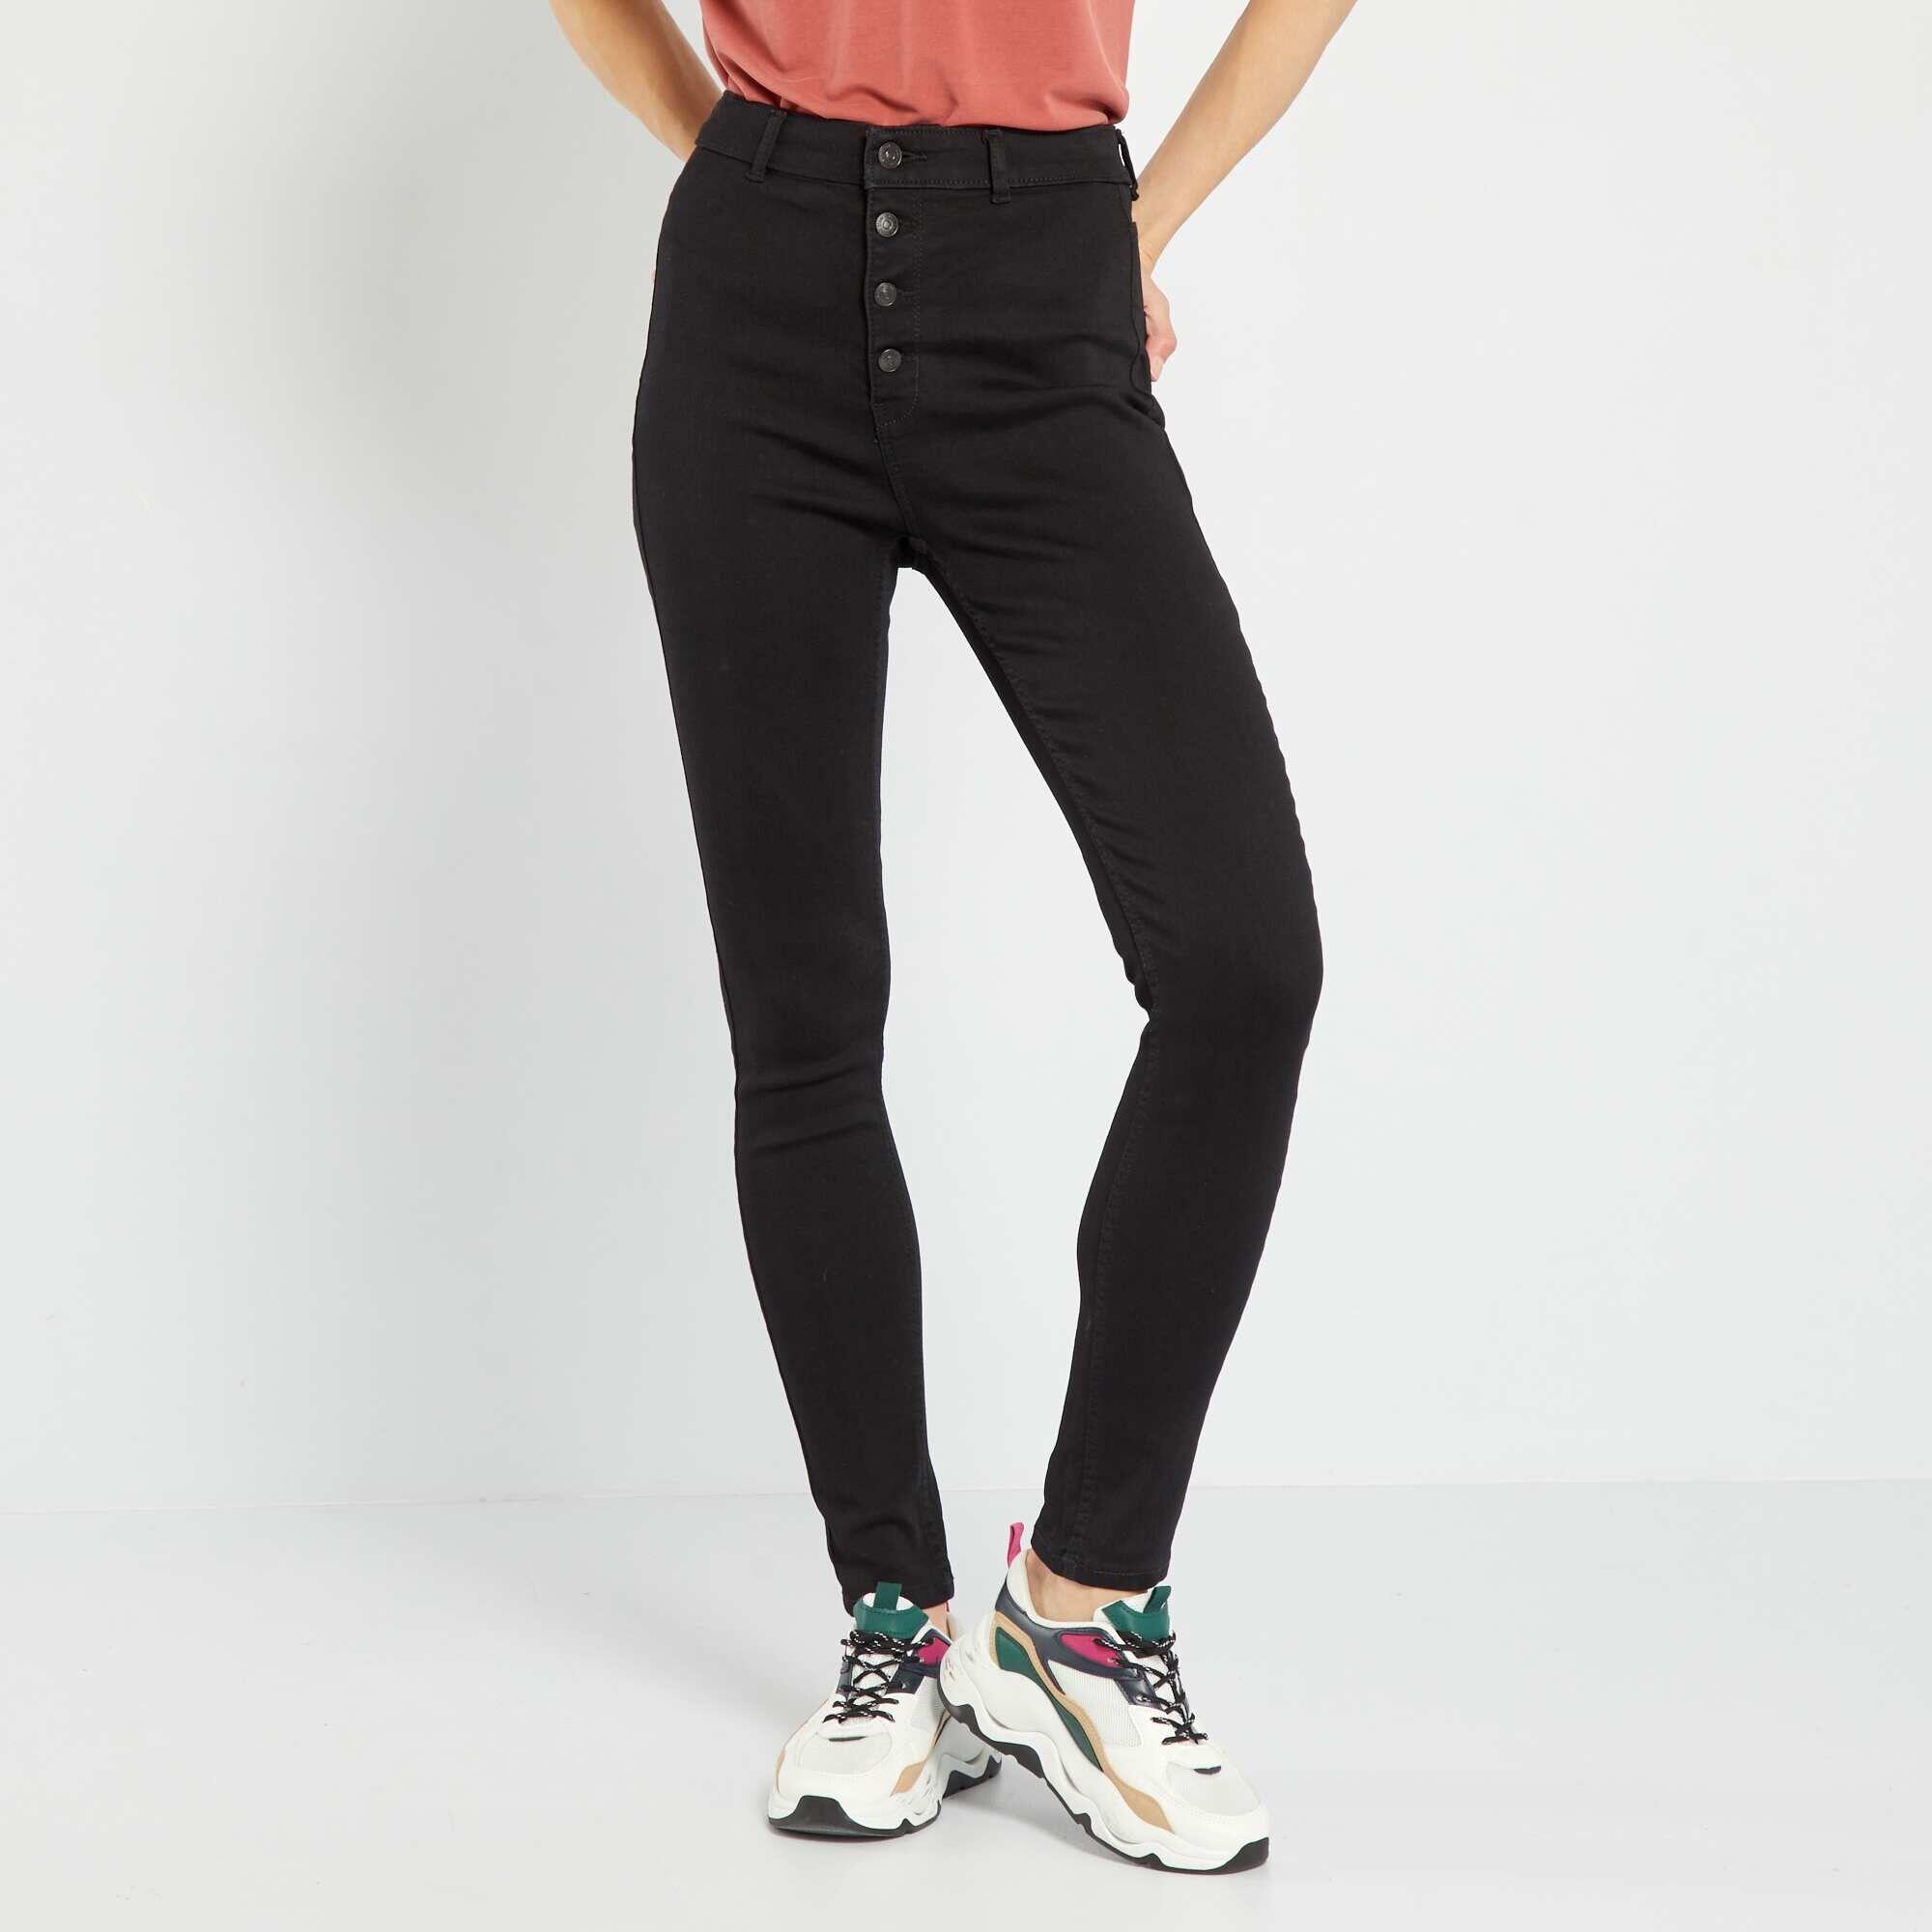 jean skinny braguette boutonn e femme noir kiabi 18 00. Black Bedroom Furniture Sets. Home Design Ideas